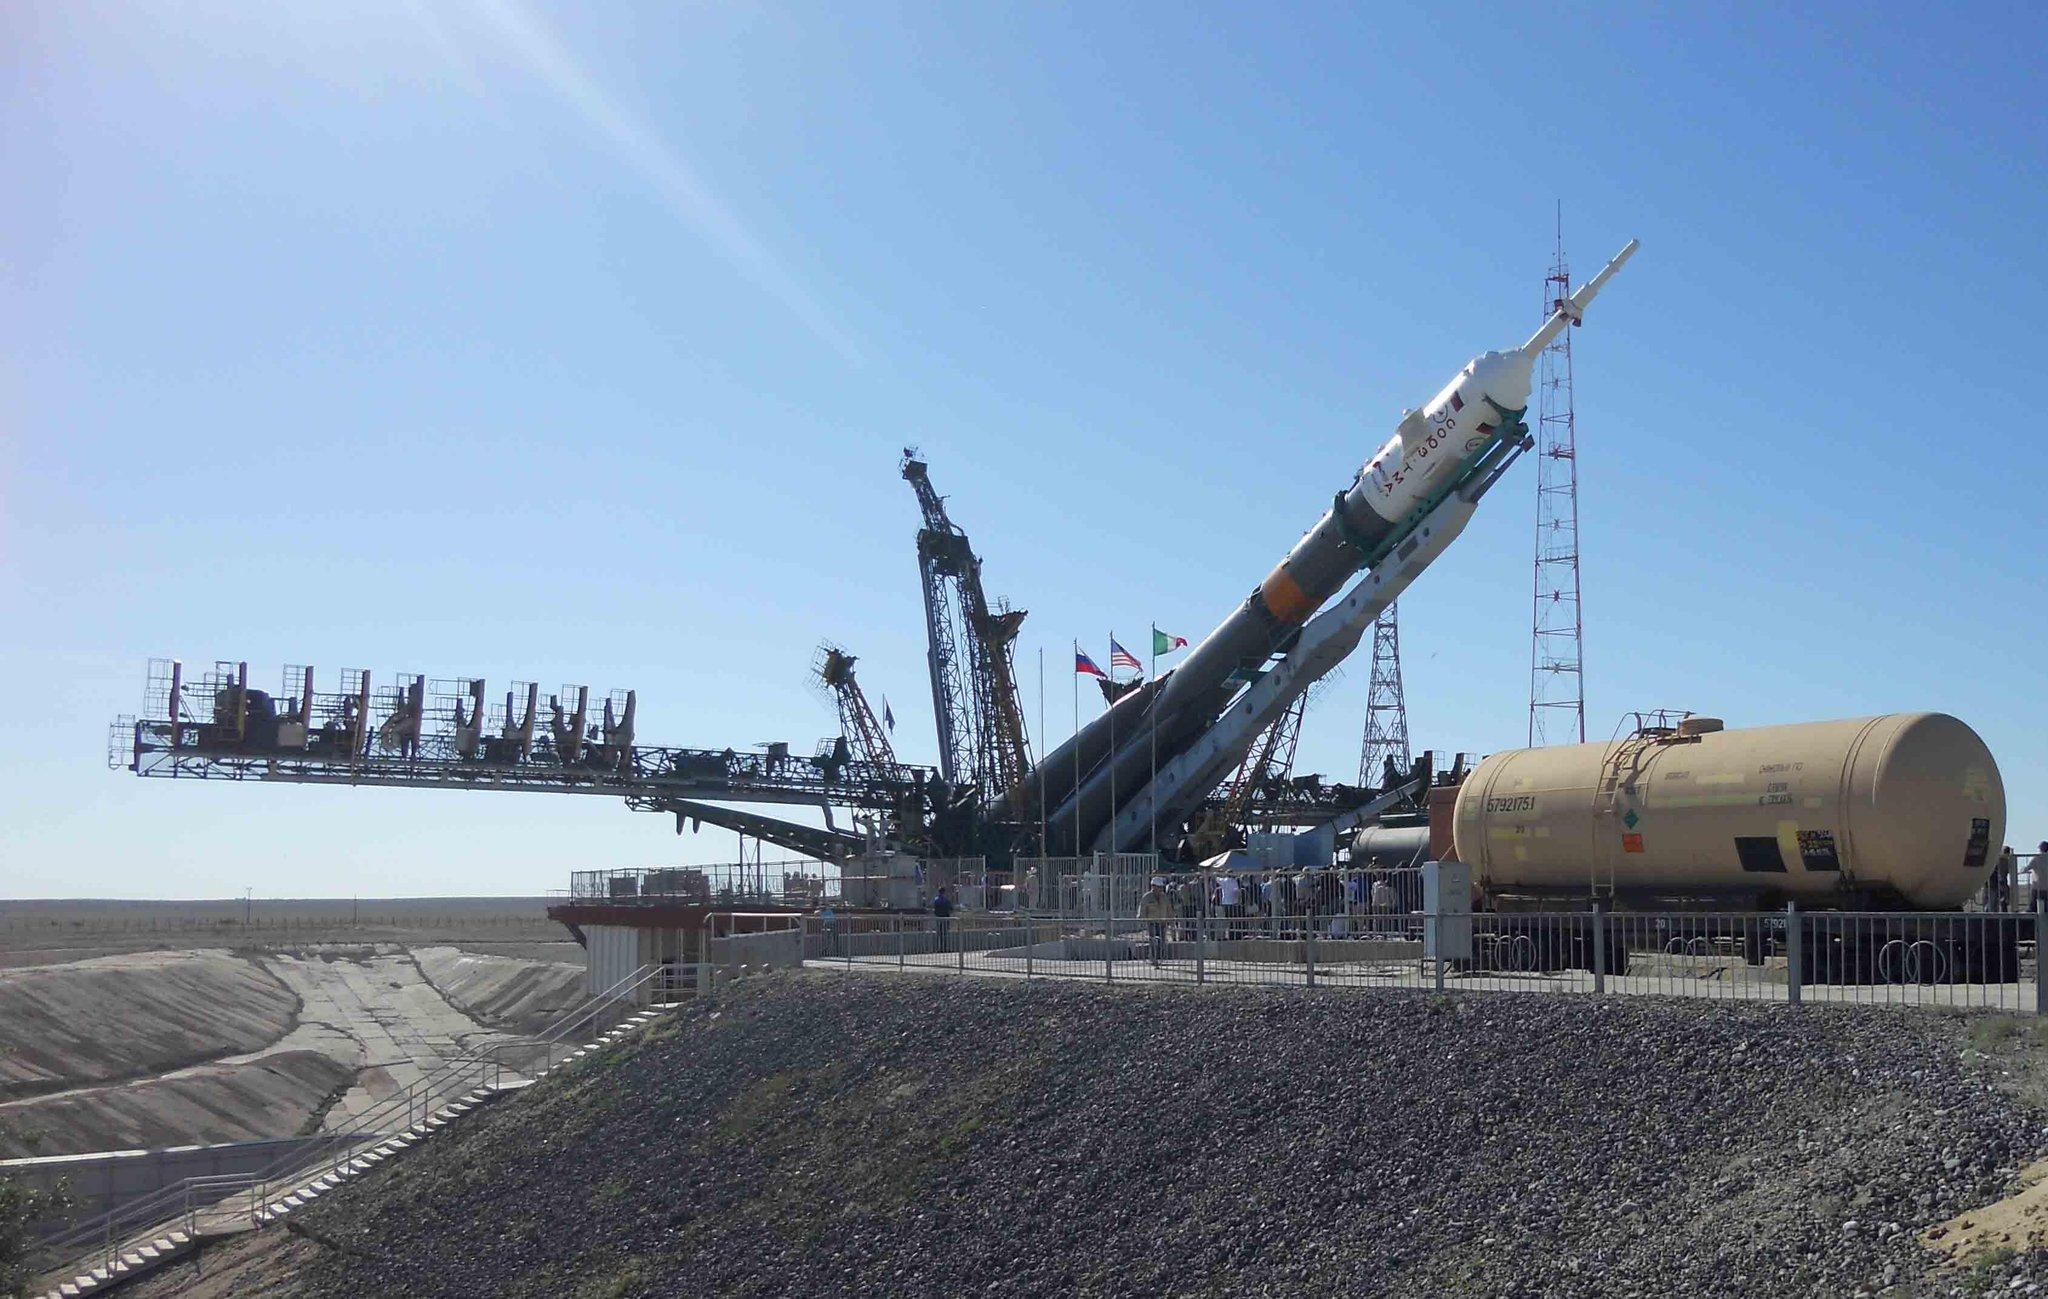 Lancement, mission & retour sur terre Soyouz TMA-09M  BLLkXsjCAAAvqM9